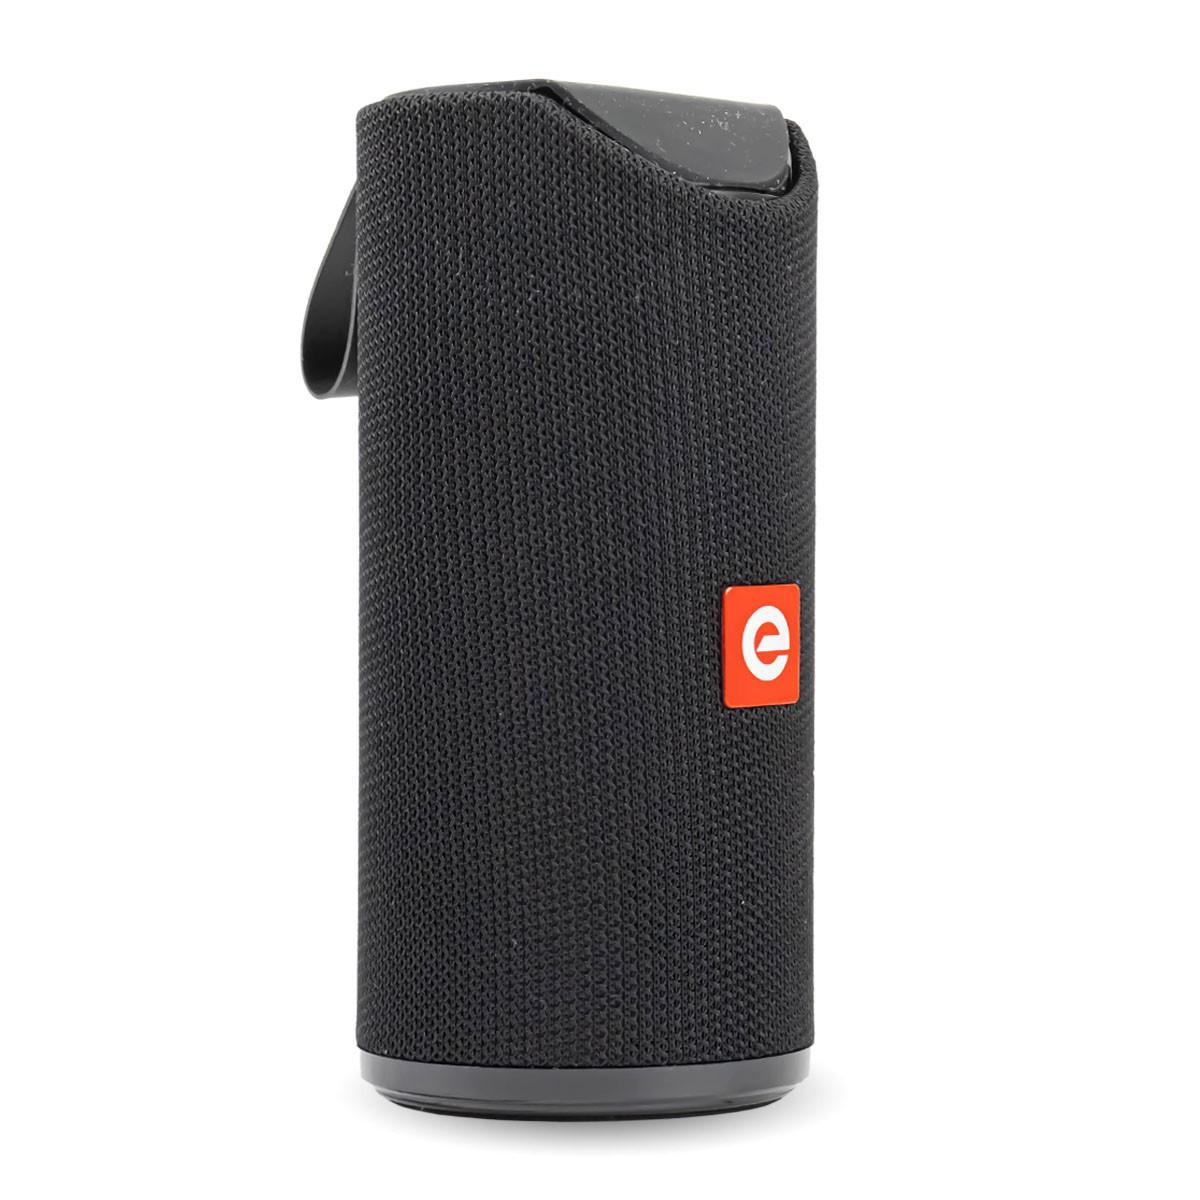 Caixa de Som Bluetooth Portátil Multimídia 5 Watts Rms Exbom CS-M31BT